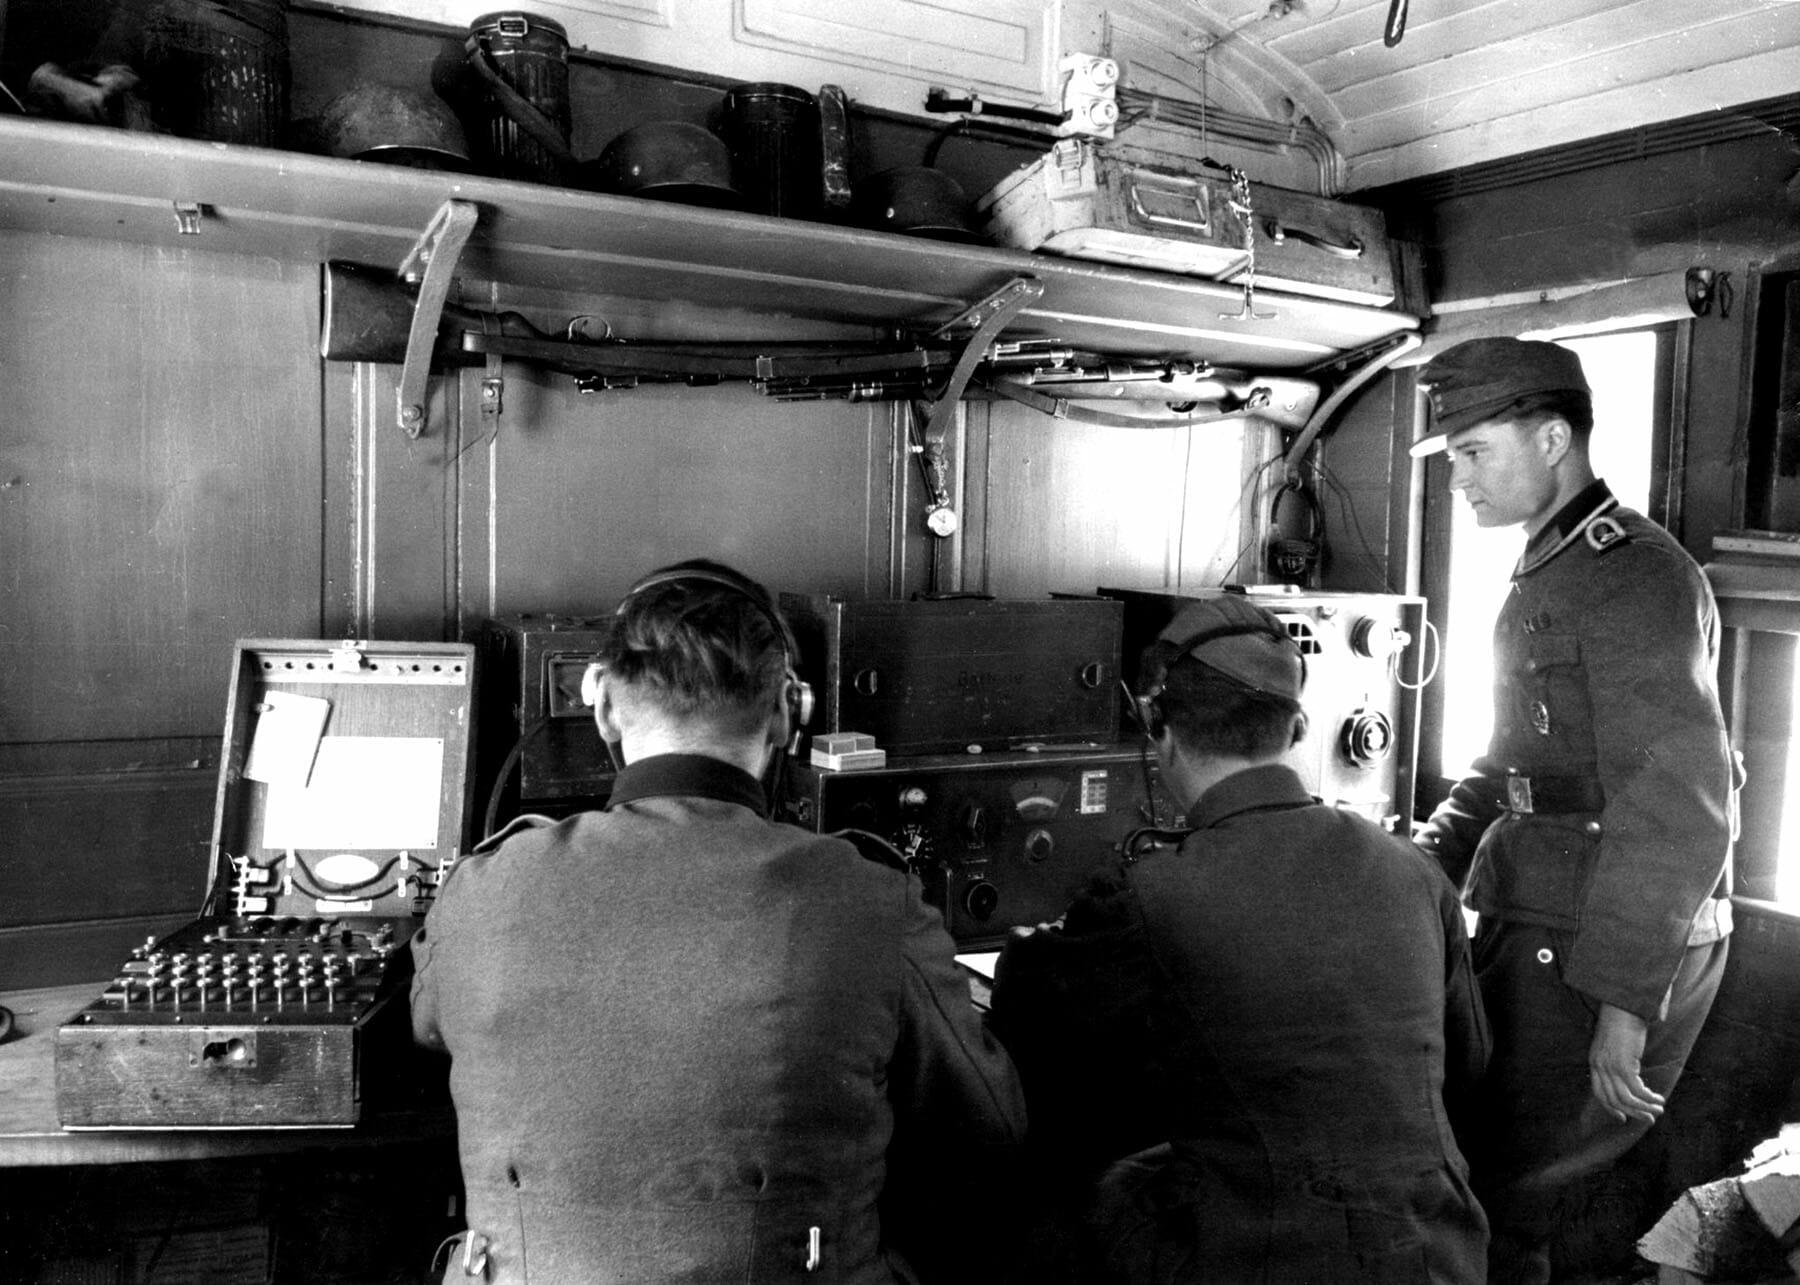 Dykker har fundet seks Enigma-maskiner i havet syd for Danmark